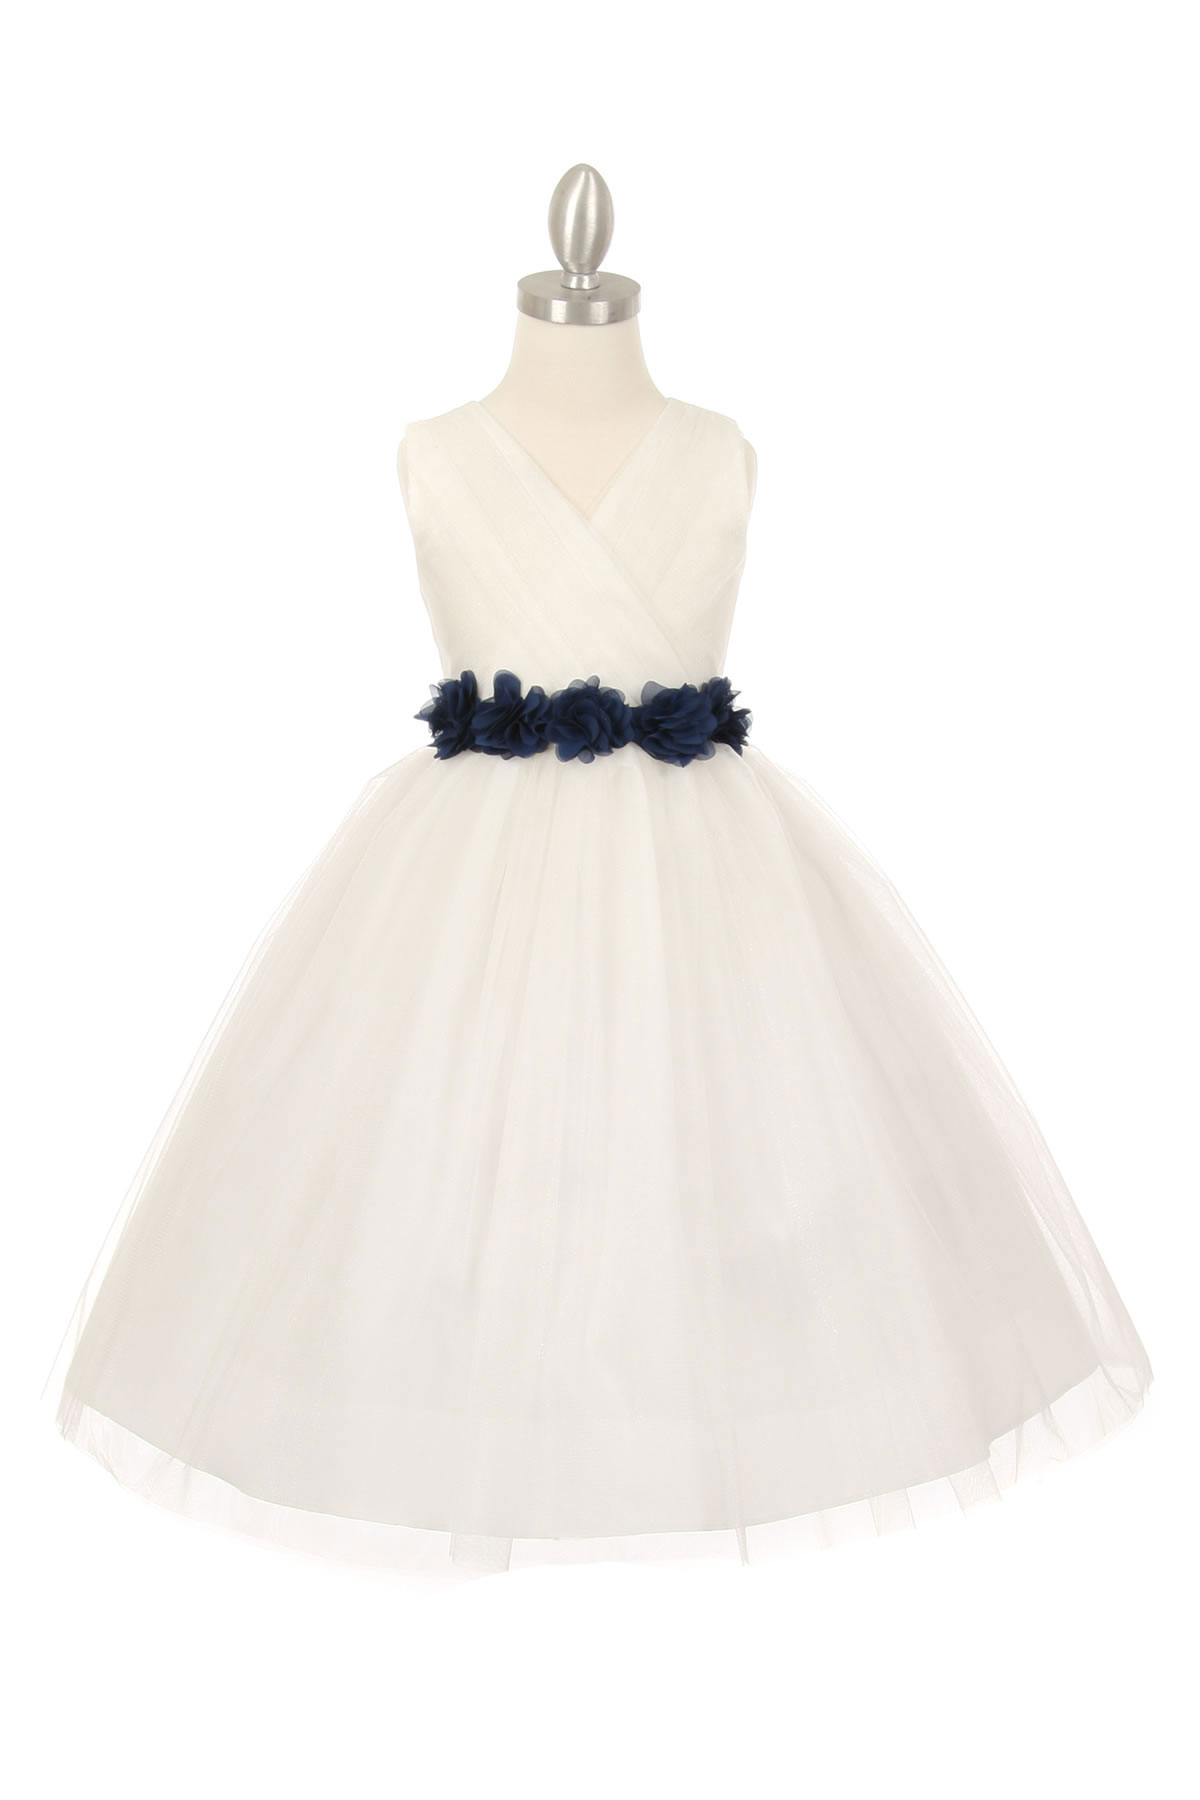 CC 1220IVNV Girls Dress Style 1220 IVORY Dress with 14 Sash Options See